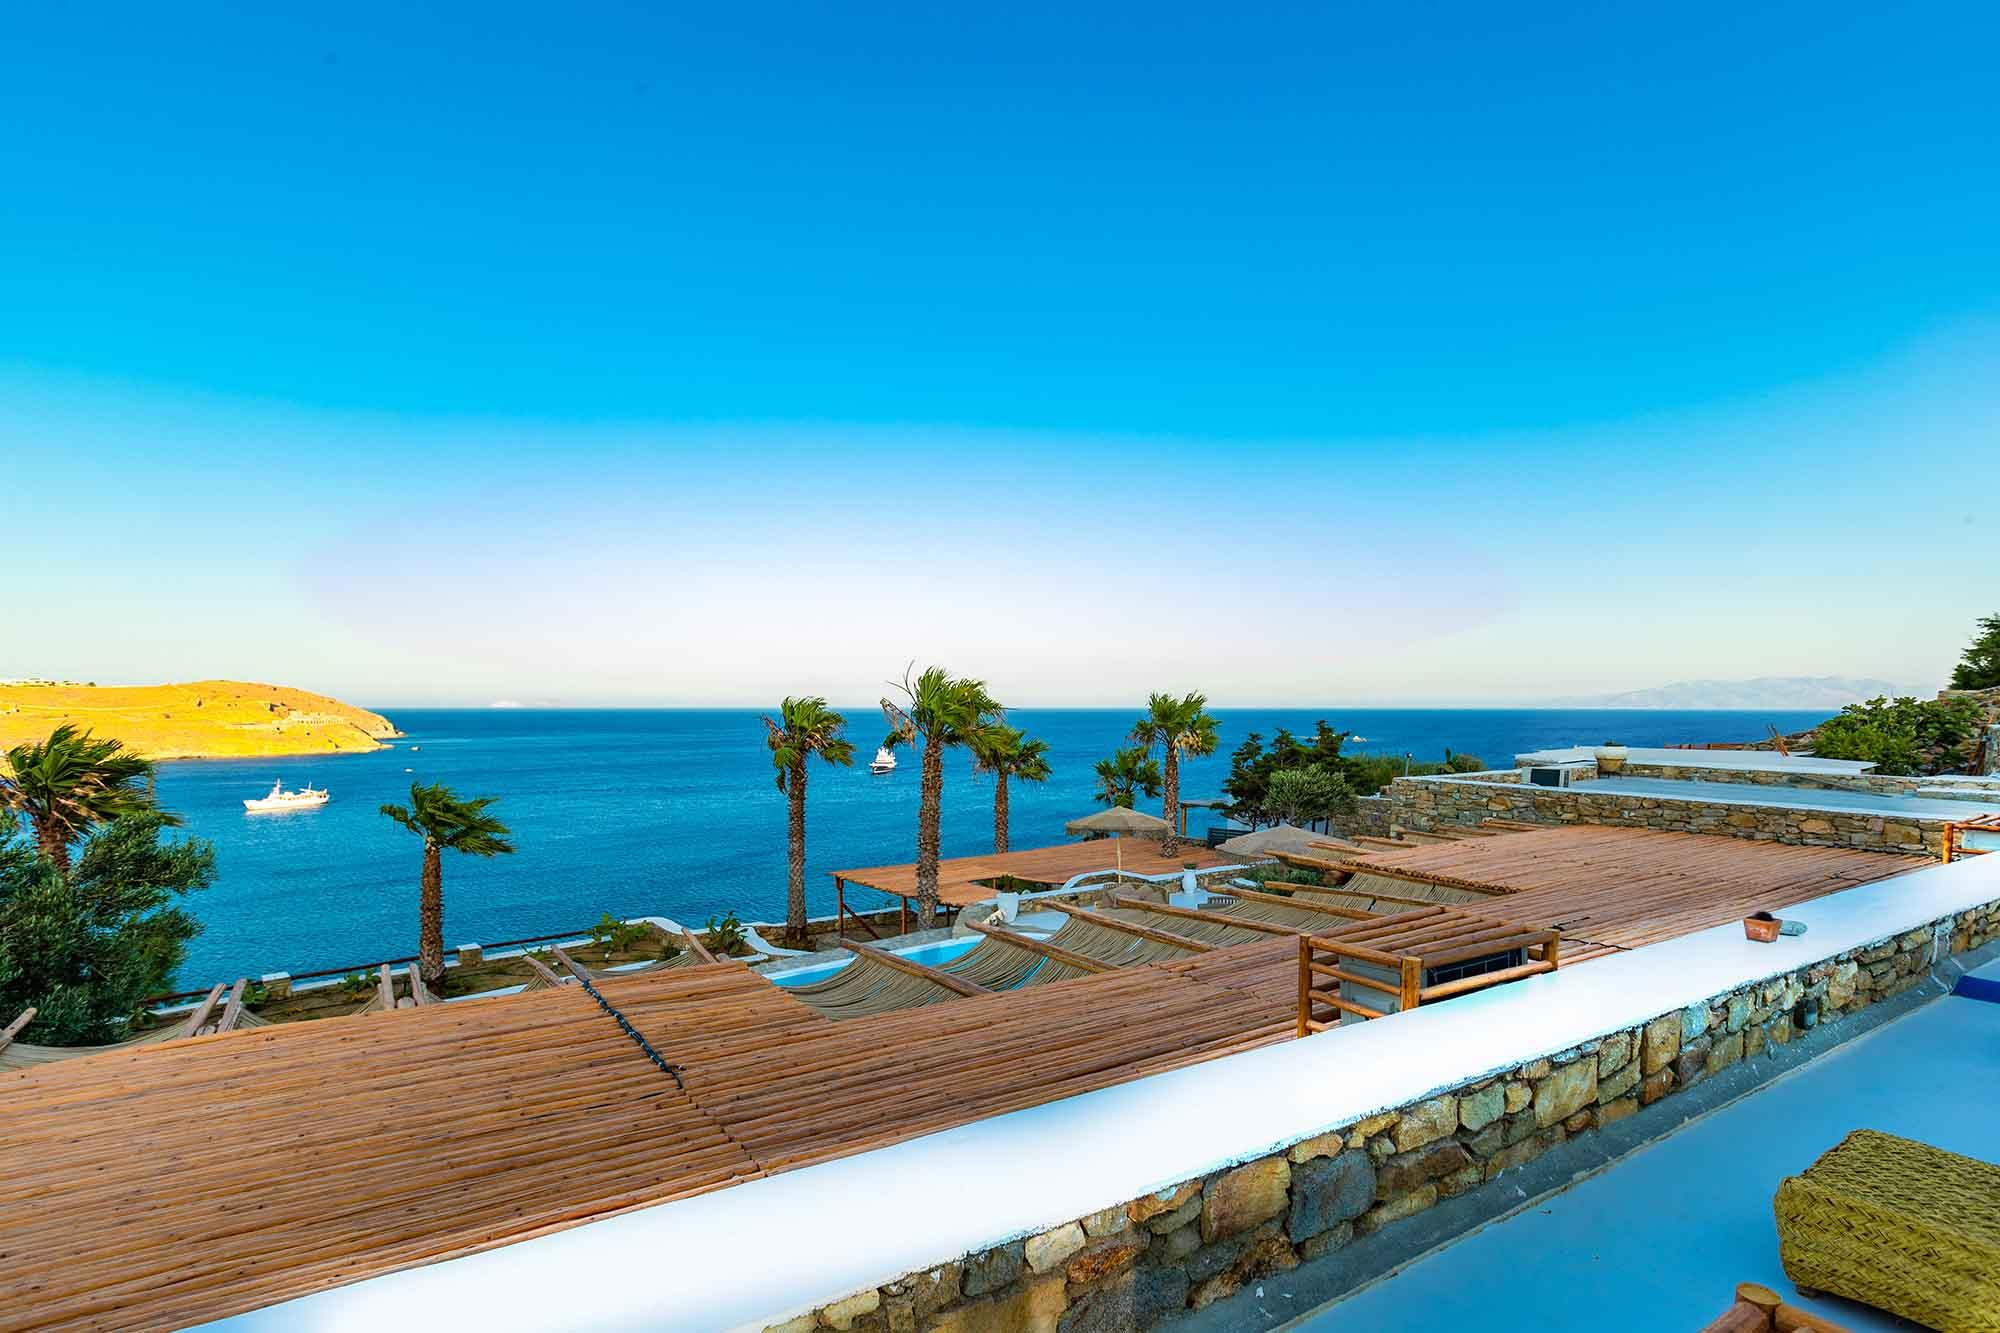 RENT A LUXURIOUS VILLA BY THE SEA IN MYKONOS - VILLA KARKOS - blue sea view